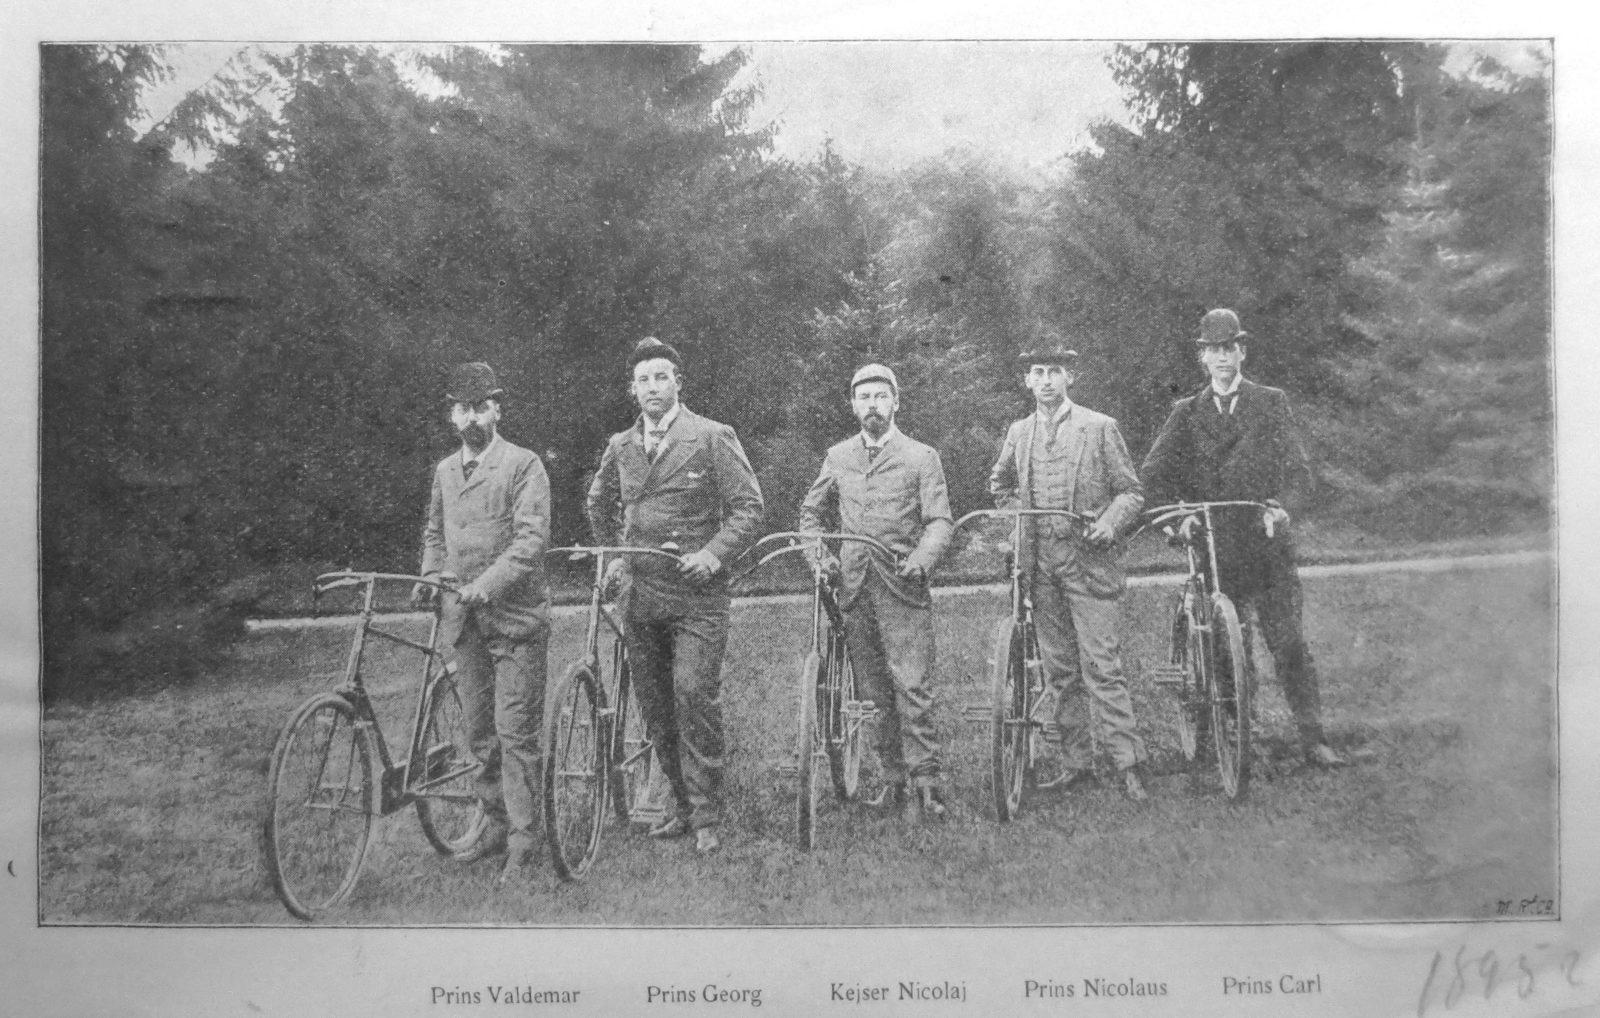 Royals 1895 - Princes Valdemar, Georg, Nicolaj, Nicolaus, Carl